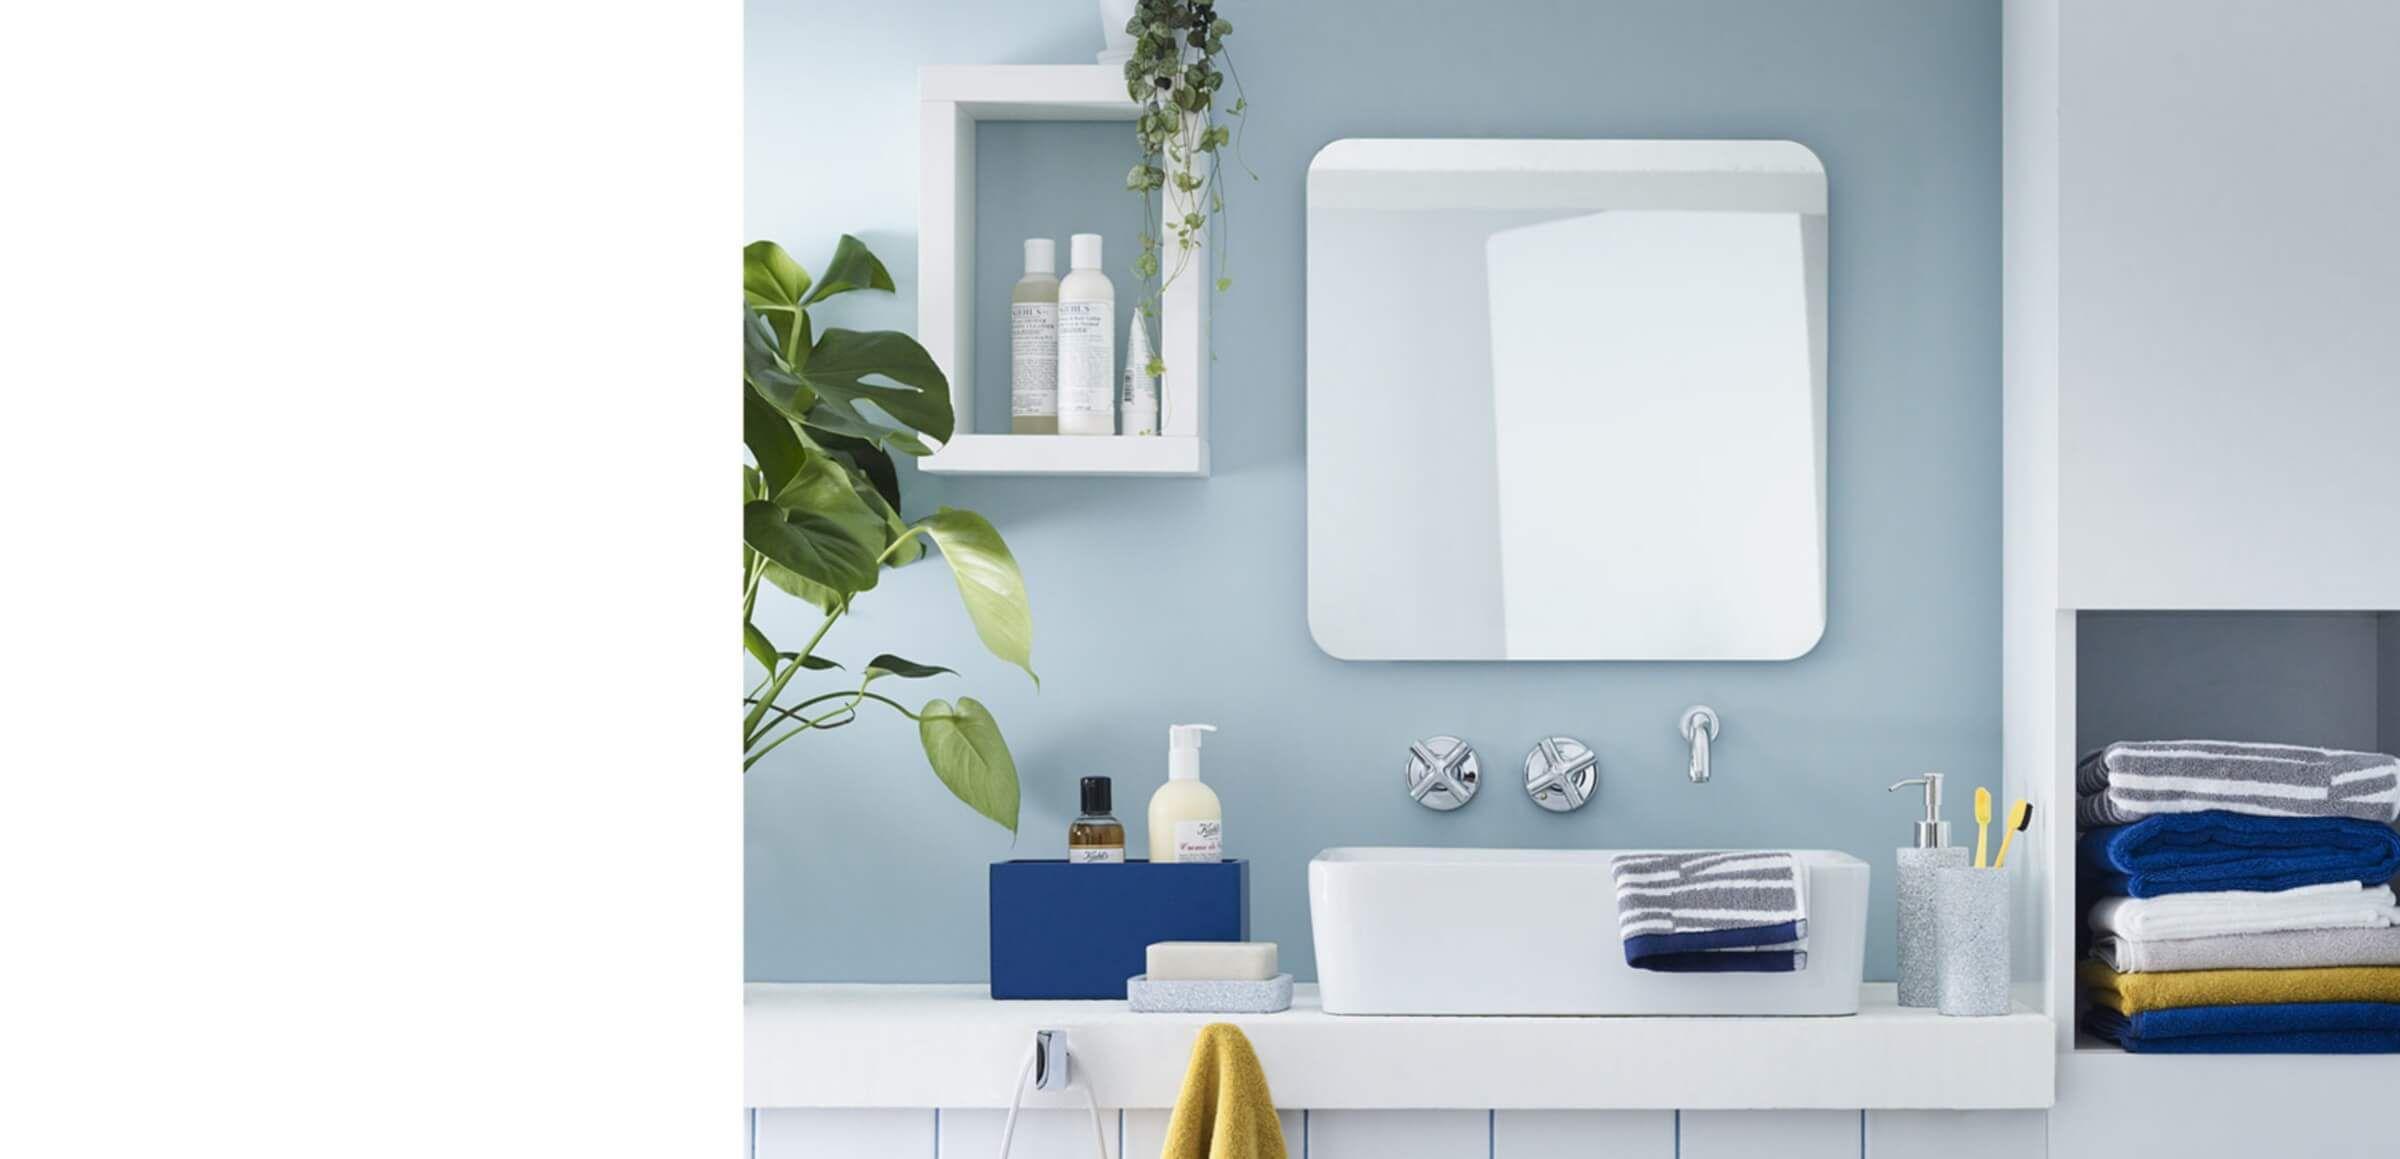 Bathroom stylish accessories uk